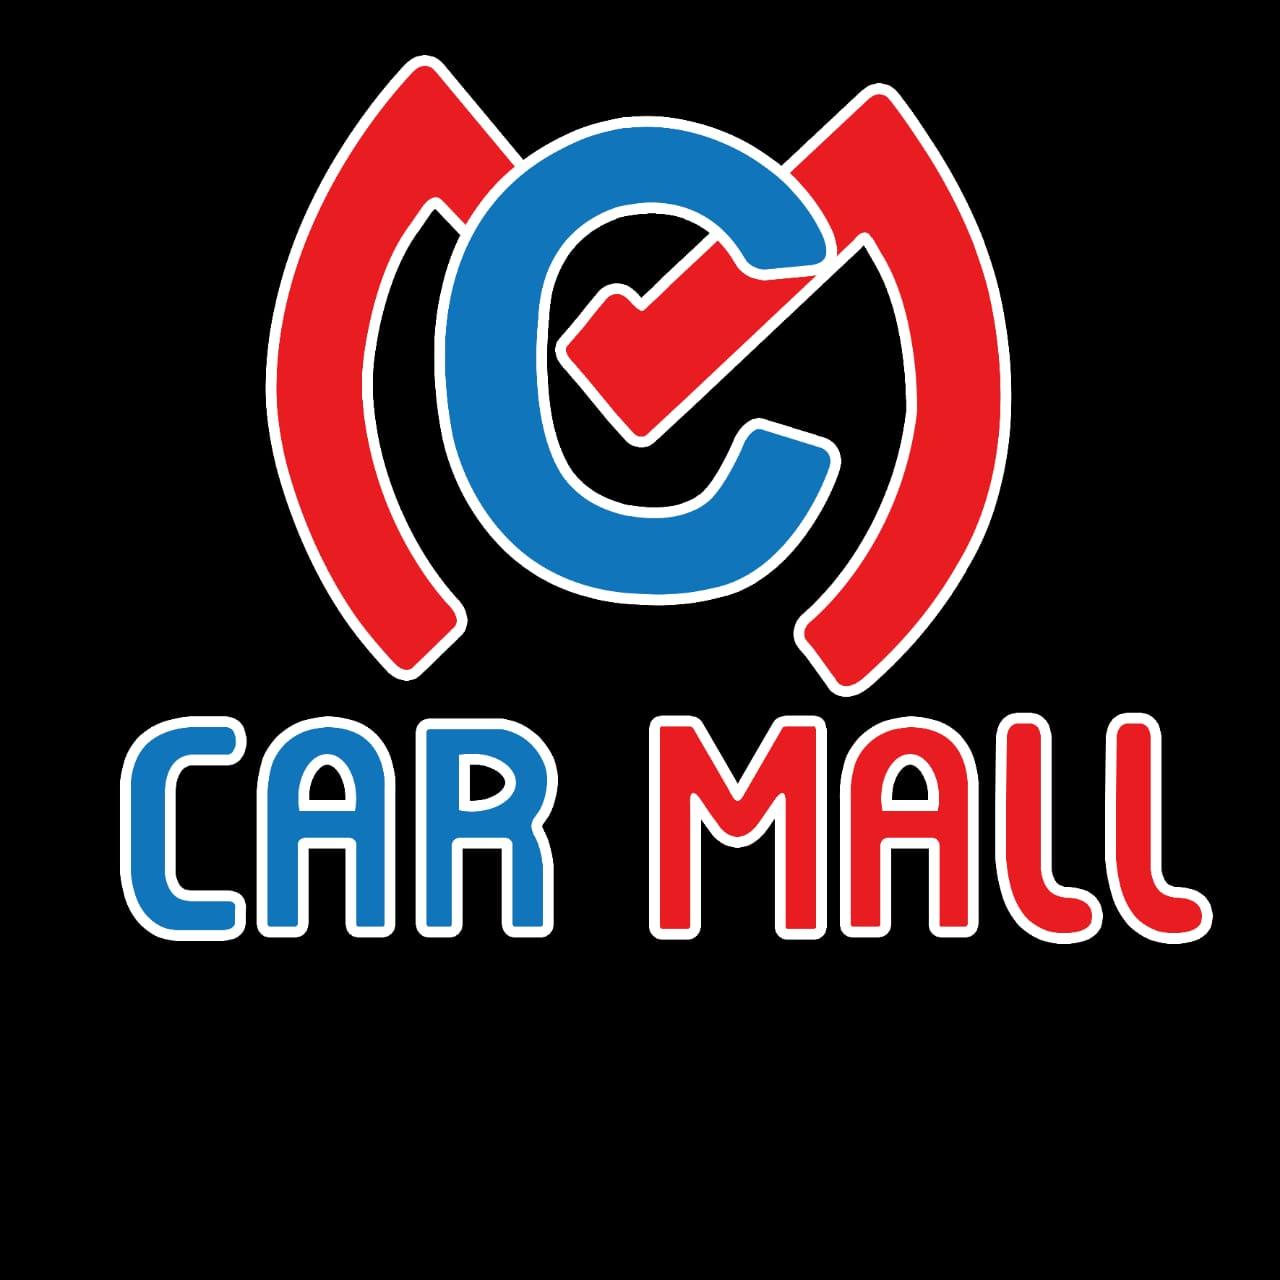 Car mall